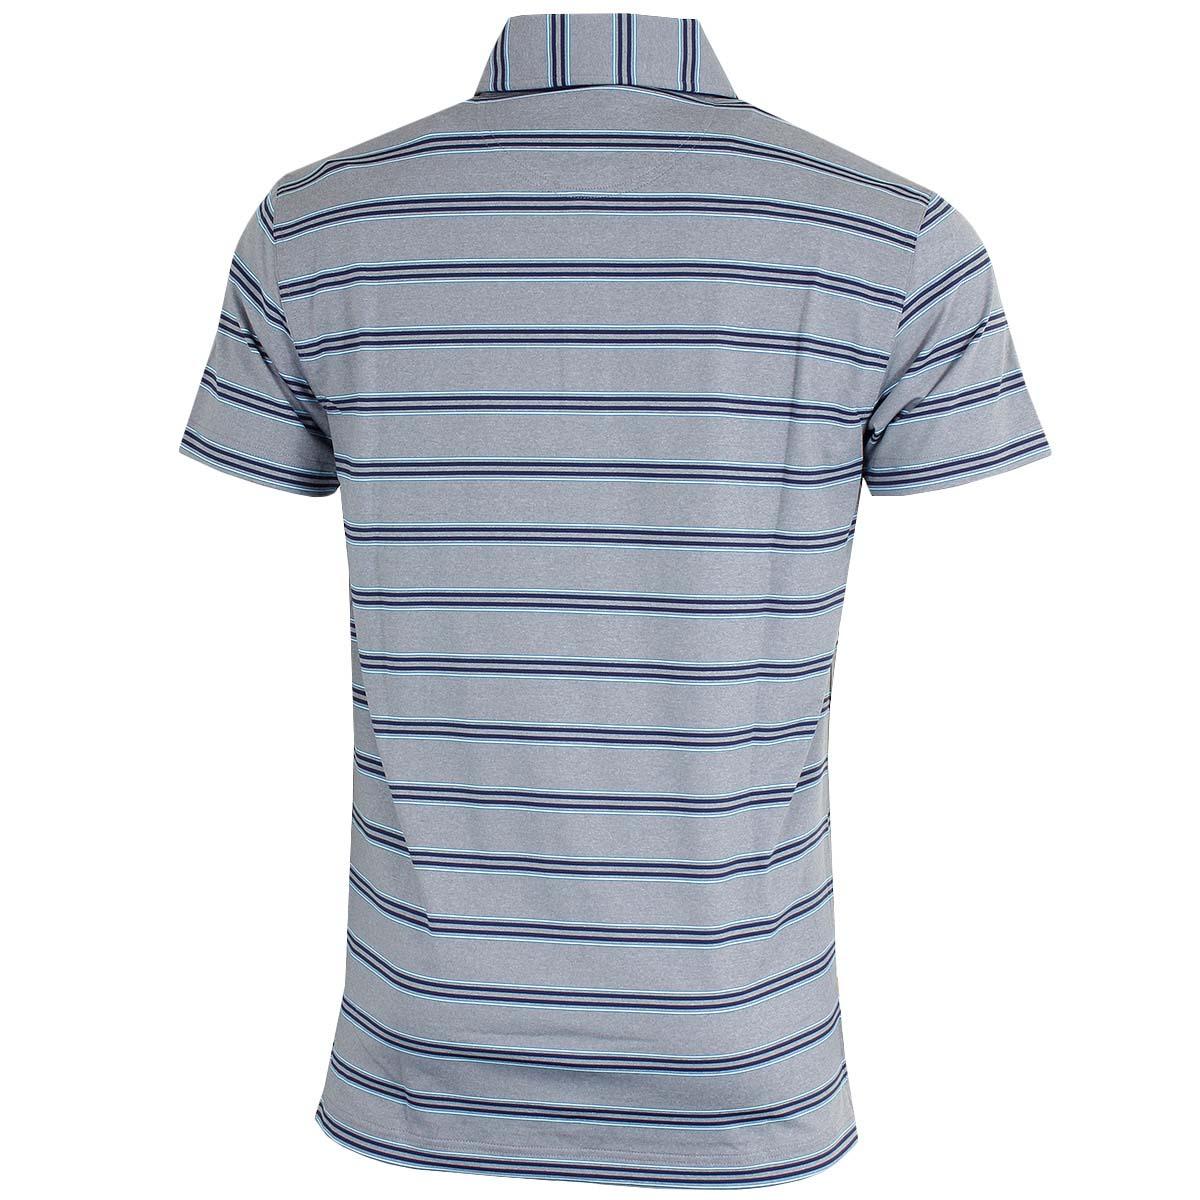 Bobby-Jones-Mens-XH20-Wren-Heather-Stripe-Stretch-Golf-Polo-Shirt-72-OFF-RRP thumbnail 3